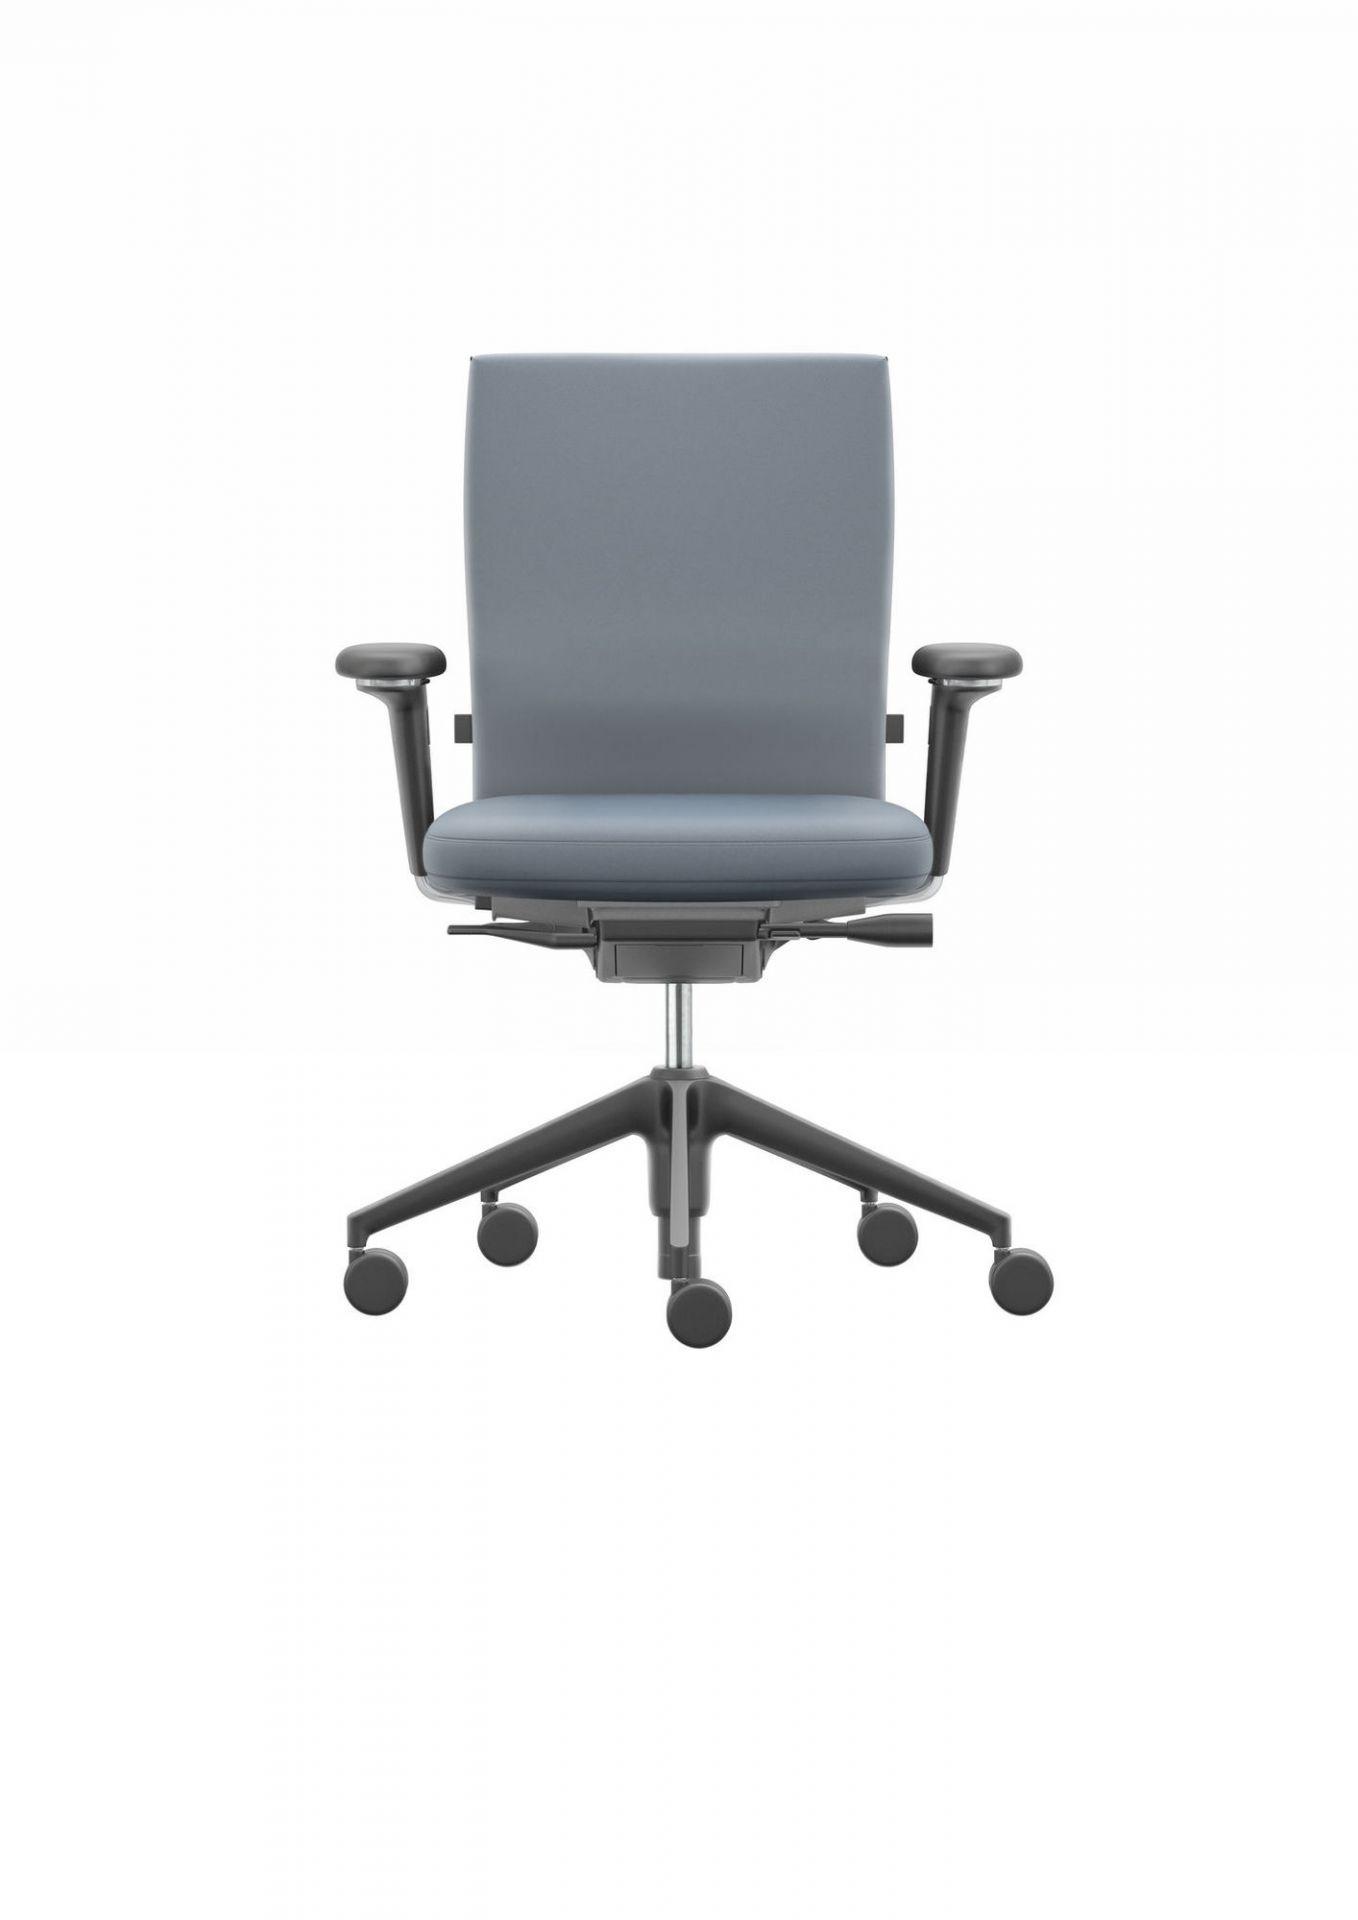 ID Chair - ID Soft Bürodrehstuhl Vitra